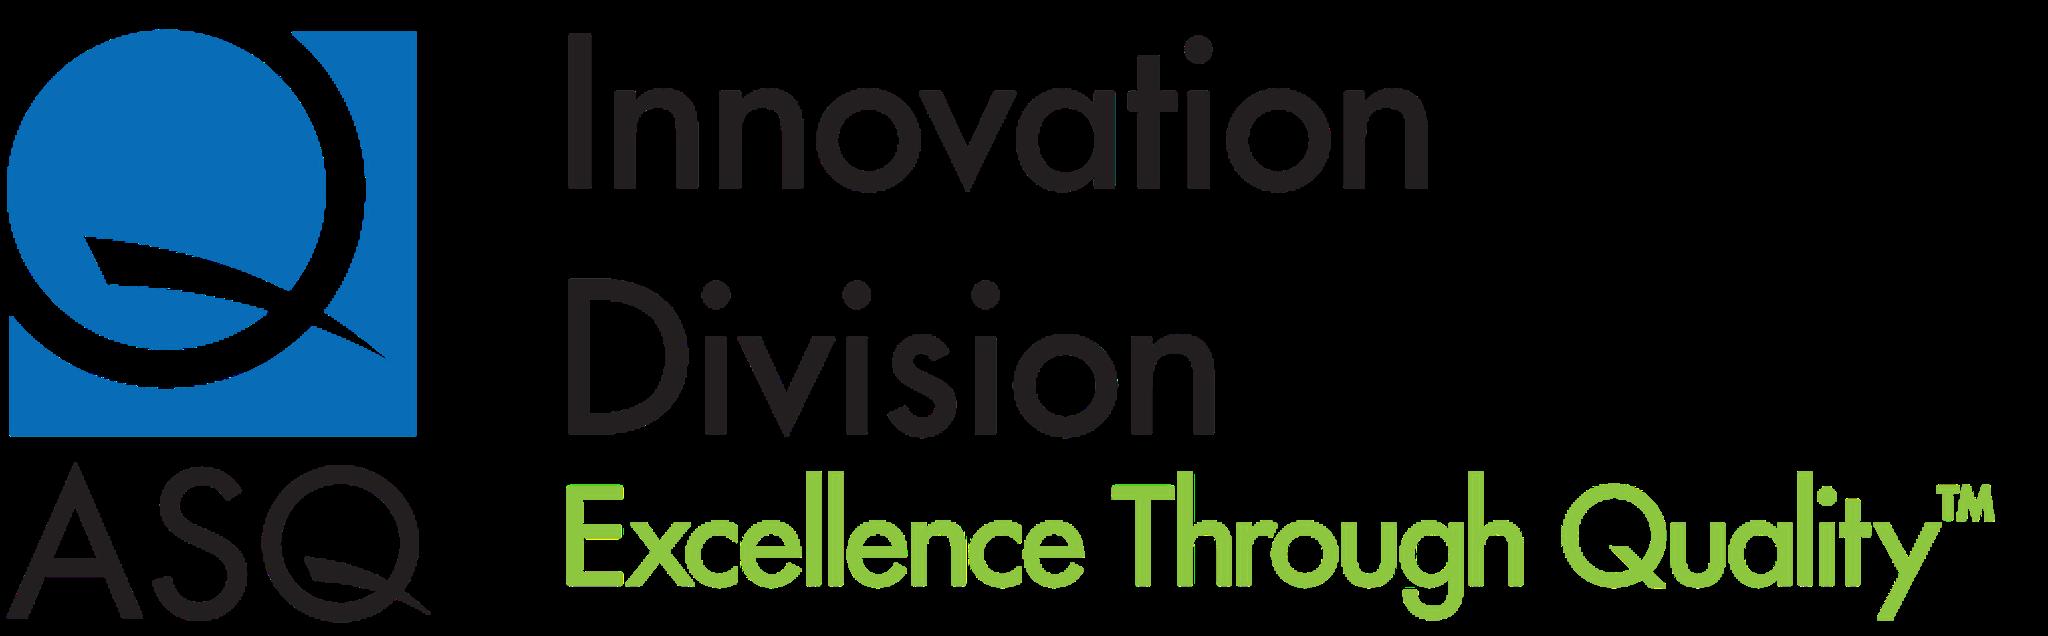 ASQ Innovation TC - Annual Member Meeting 2020 1993